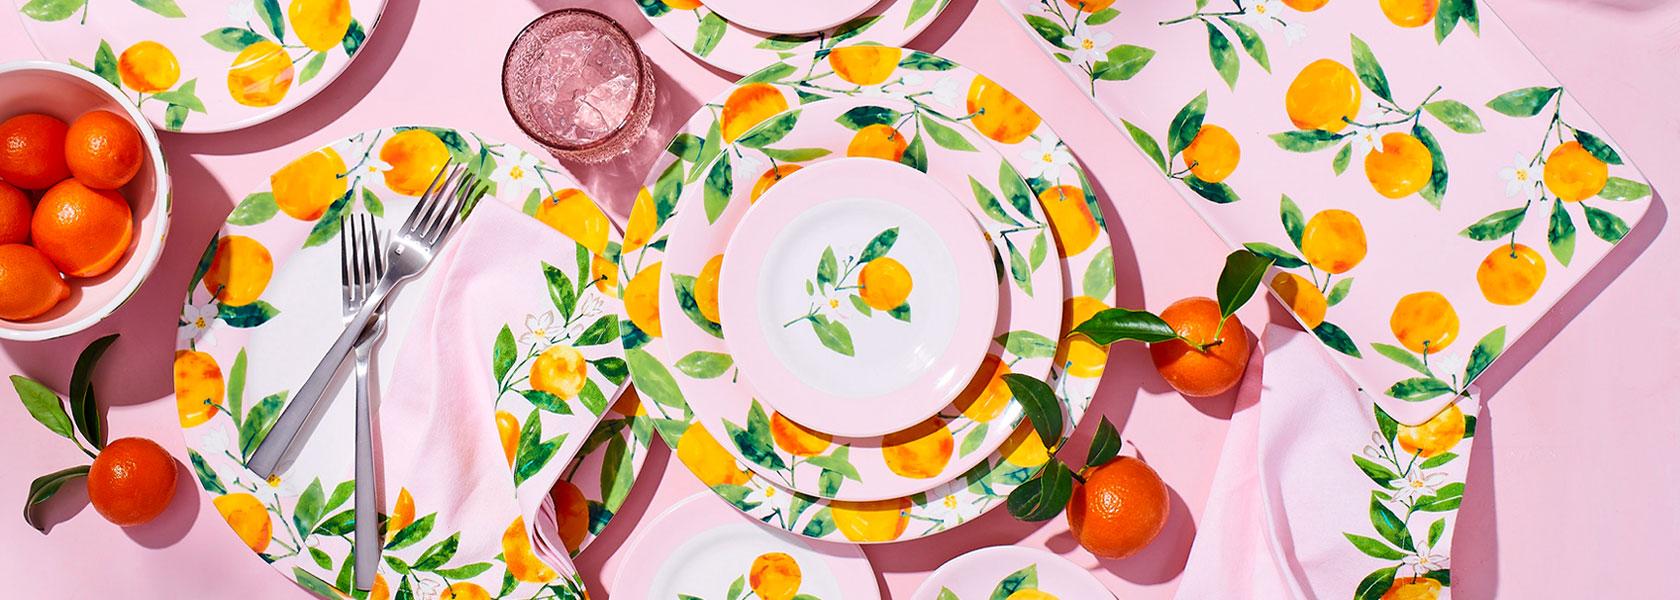 Lemon Dinnerware on pink tablecloth